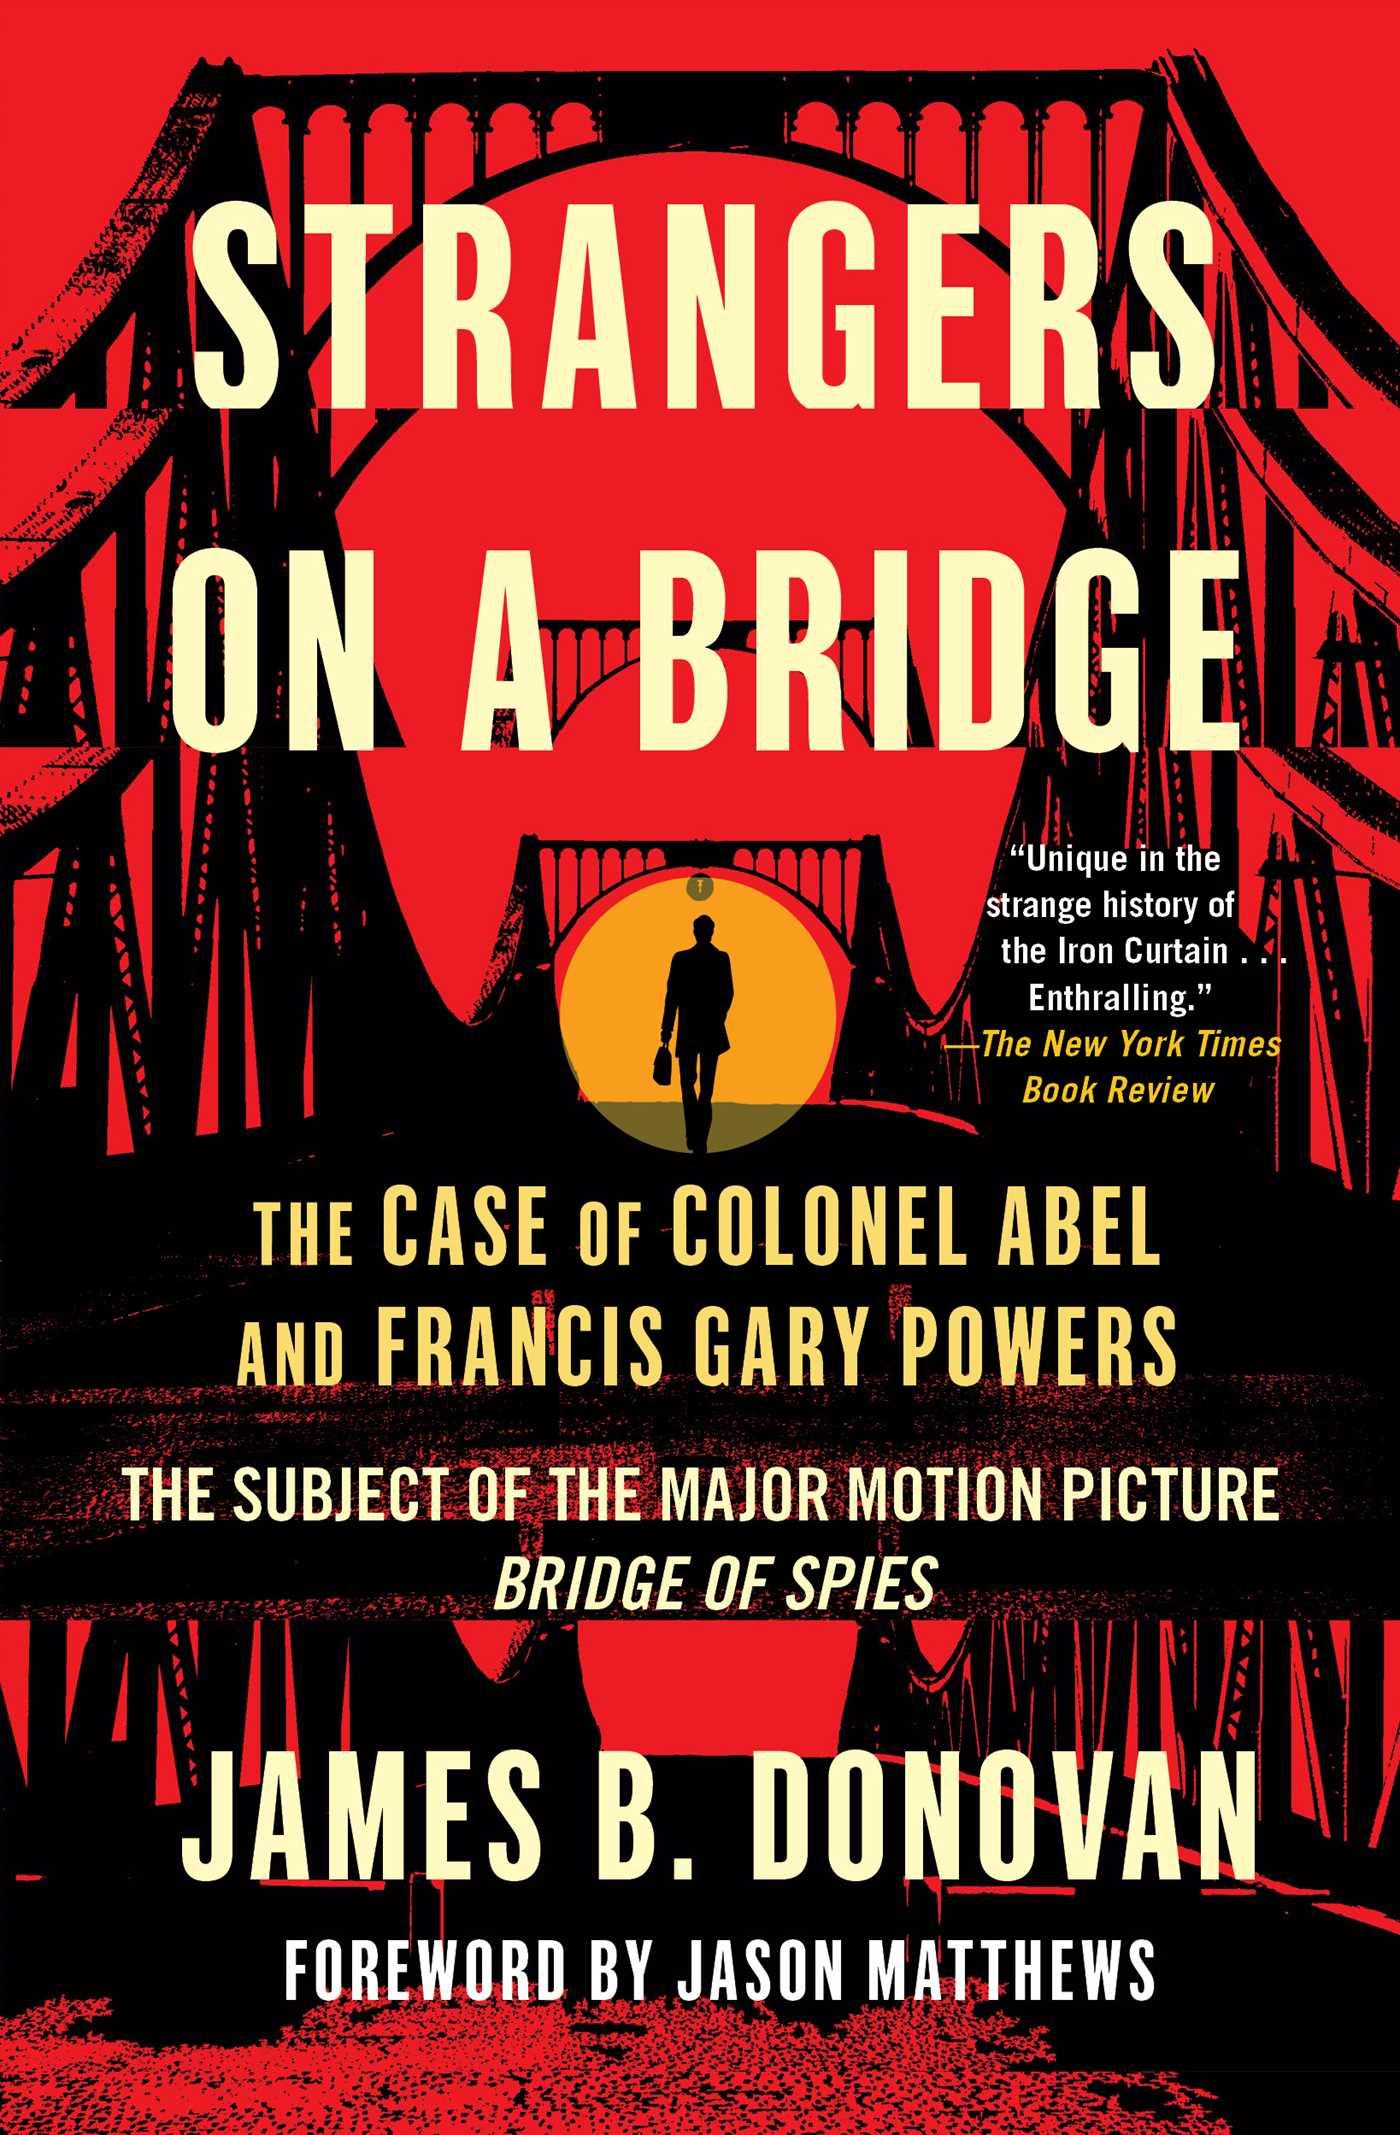 Strangers on a bridge 9781501118784 hr